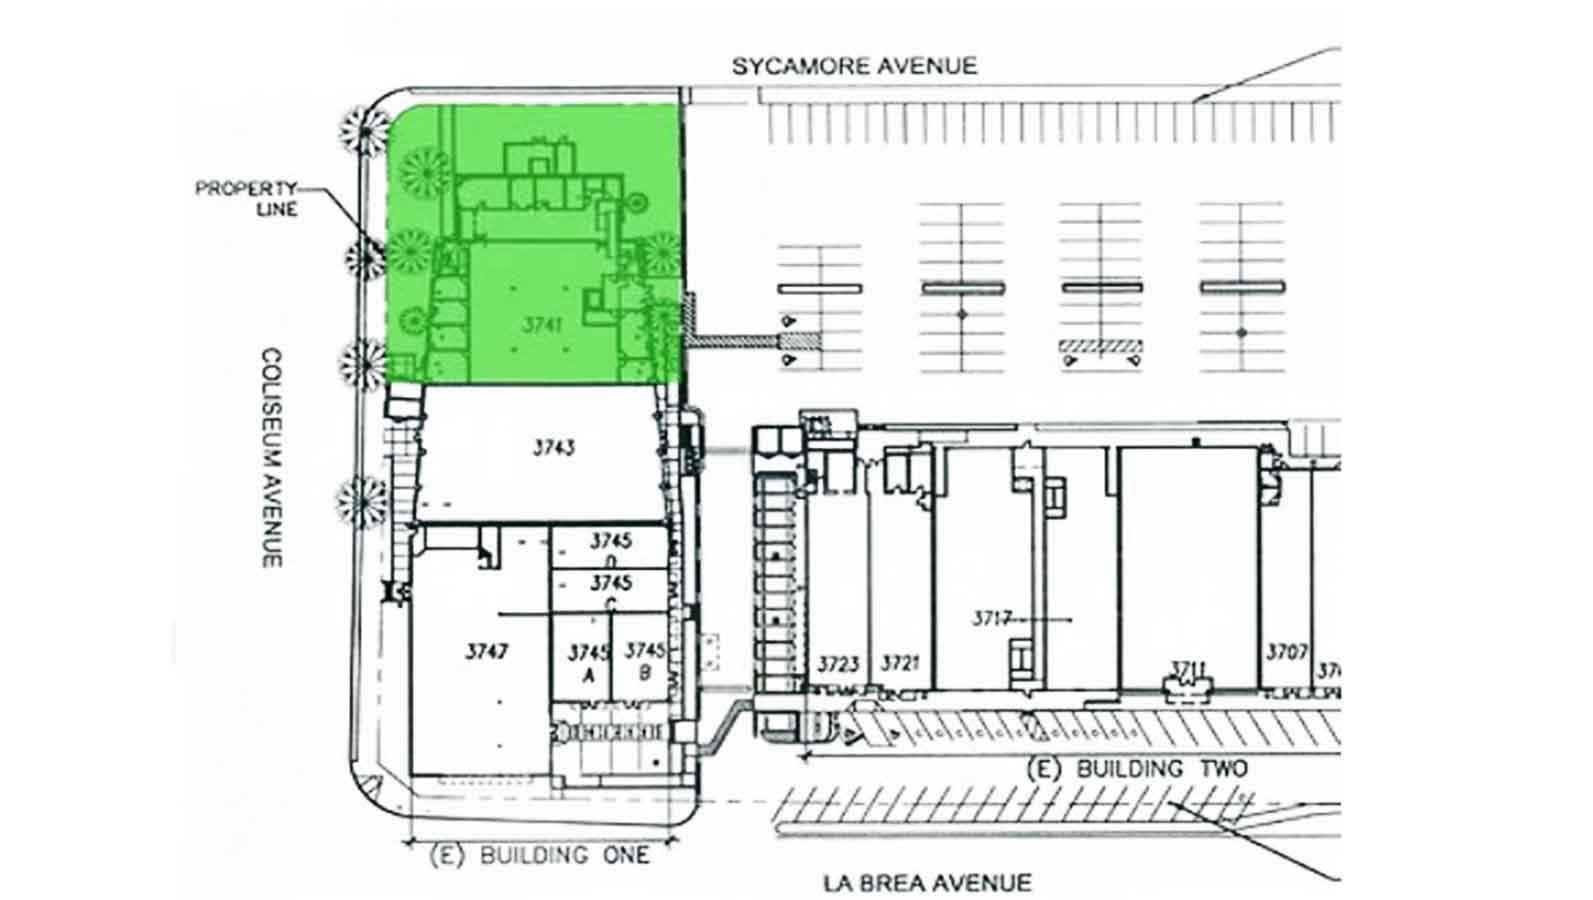 3741_Floorplan1.jpg